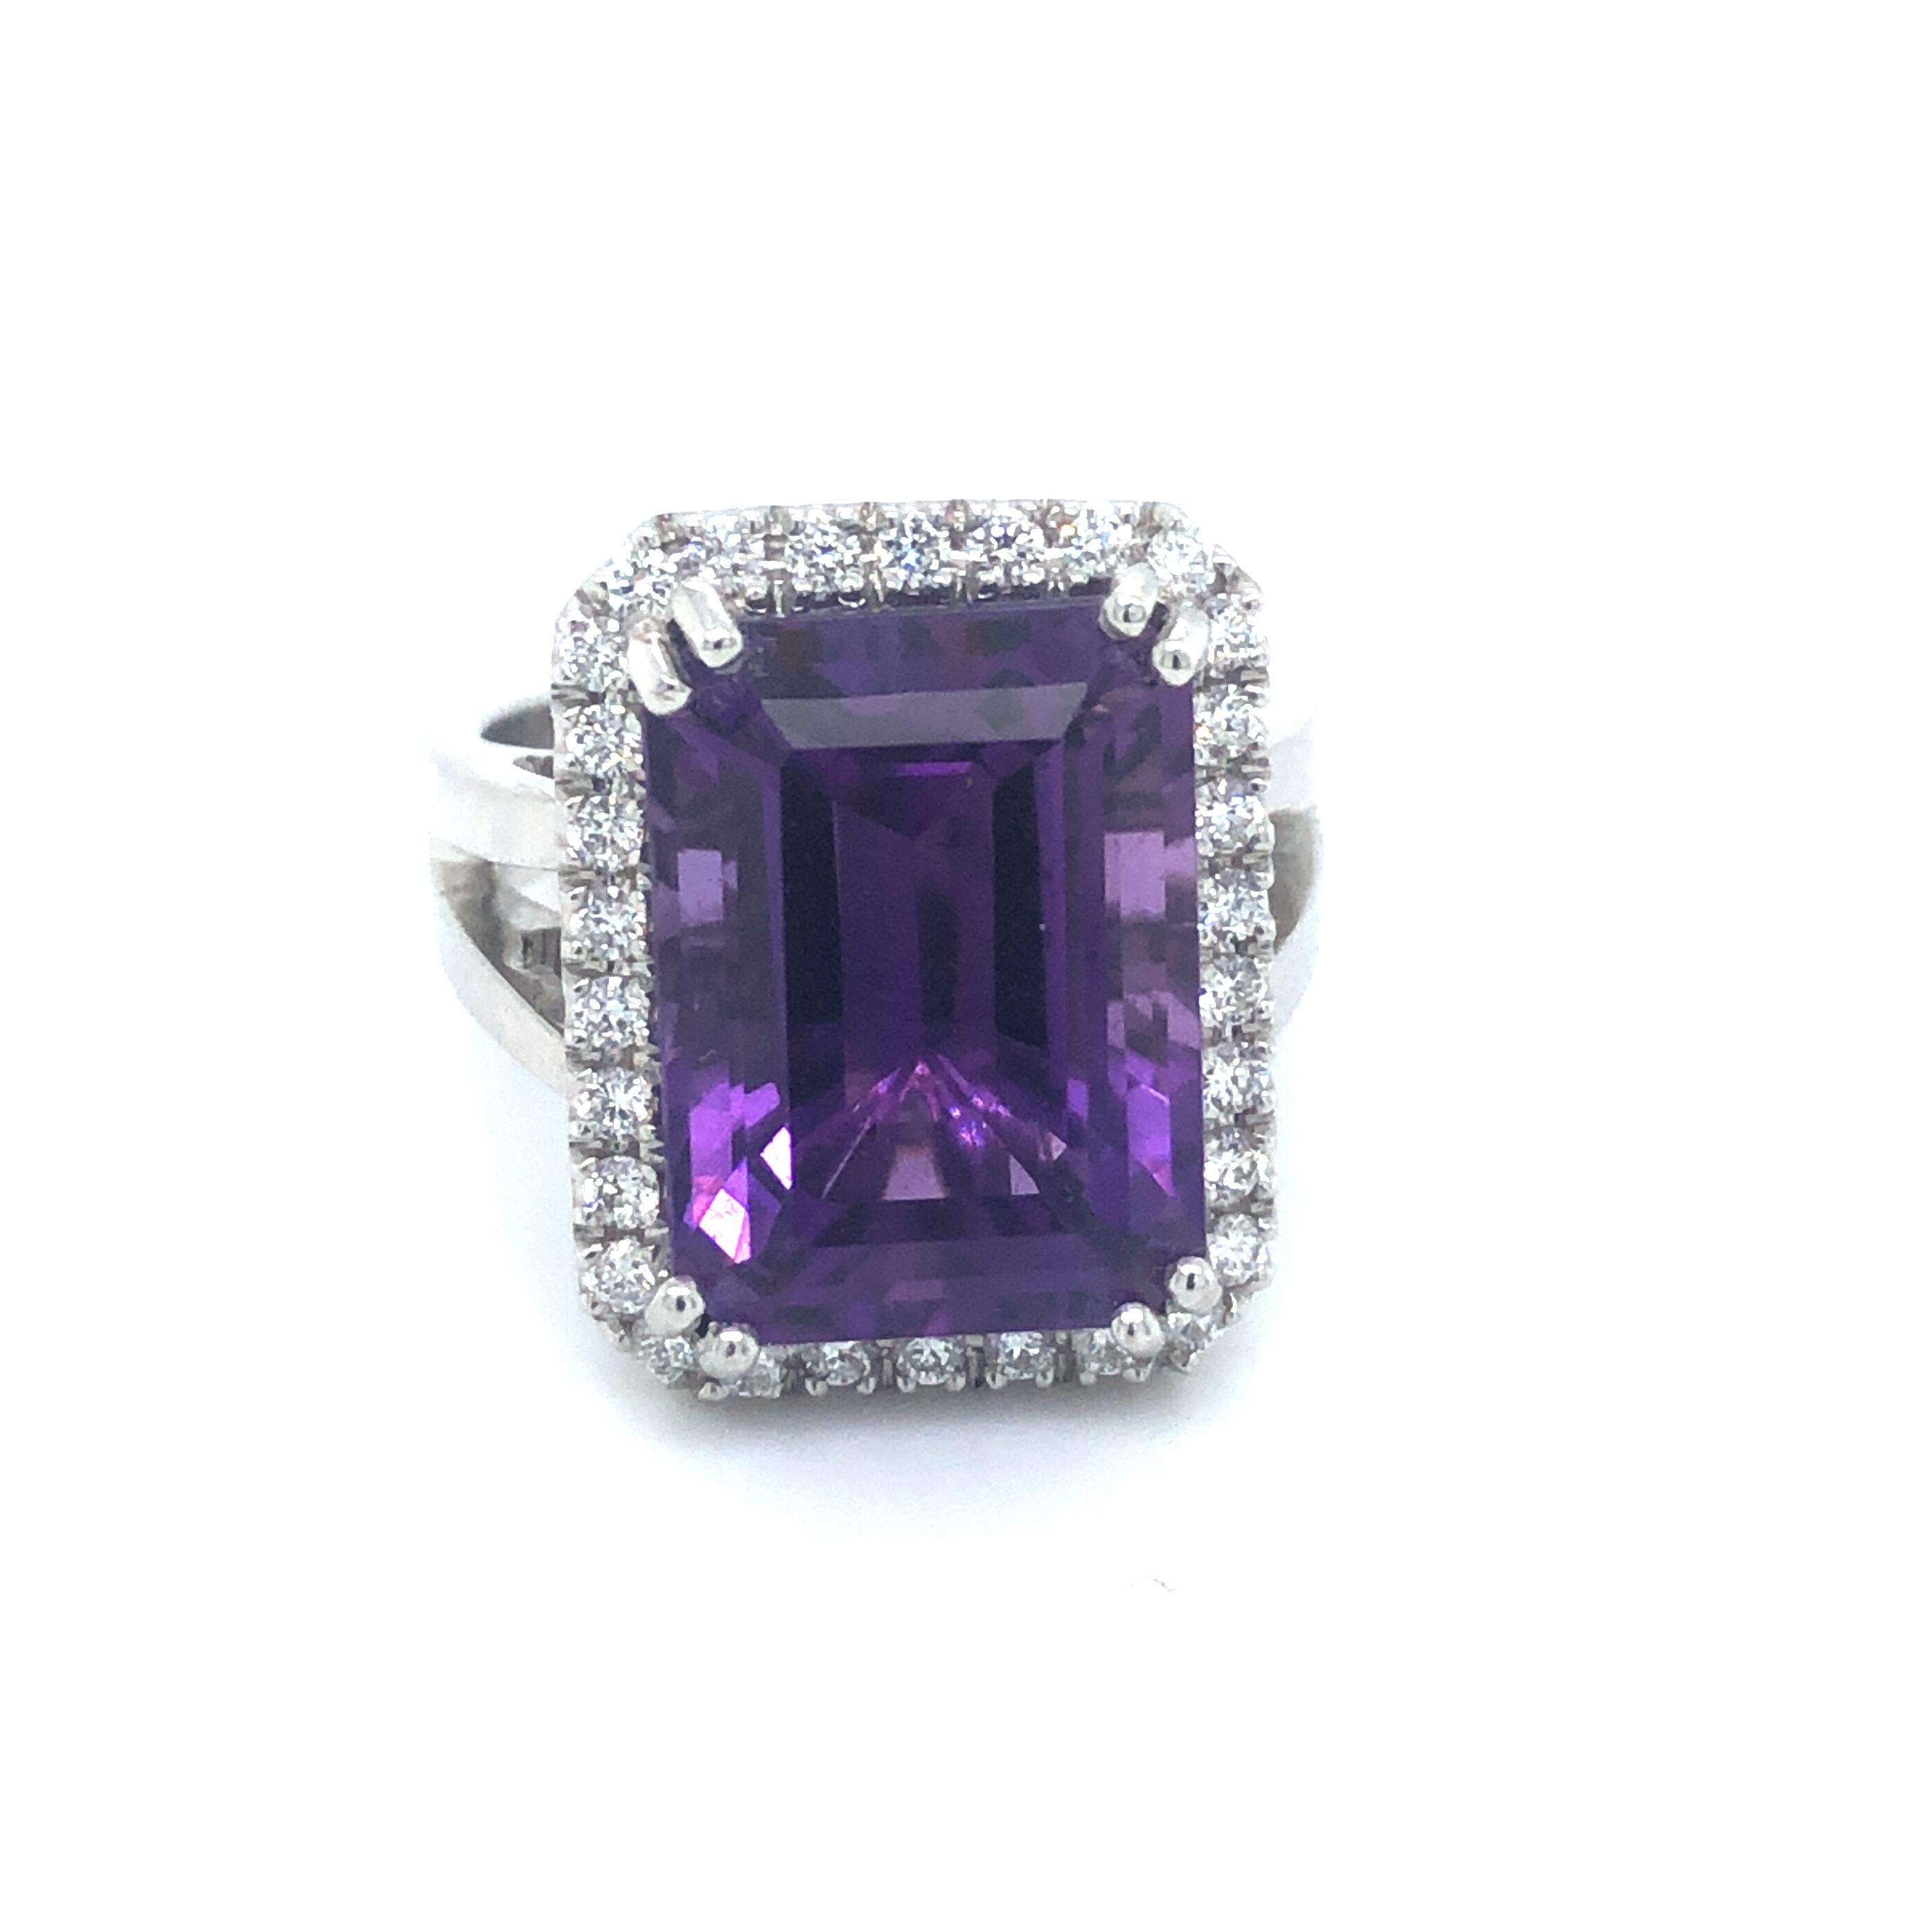 Emerald Cut Amethyst & Diamond 18ct White Gold Ring